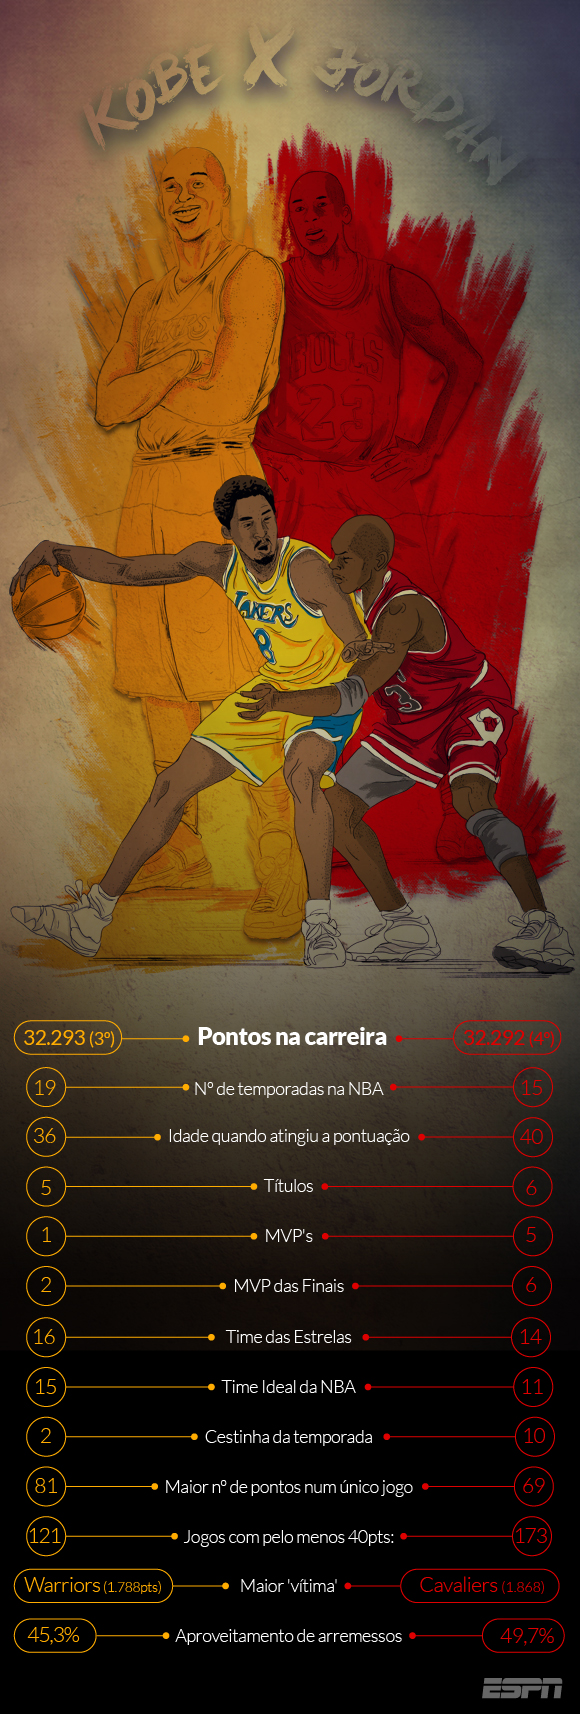 INFOGRÁFICO: Kobe Bryant supera Michael Jordan em pontos na NBA